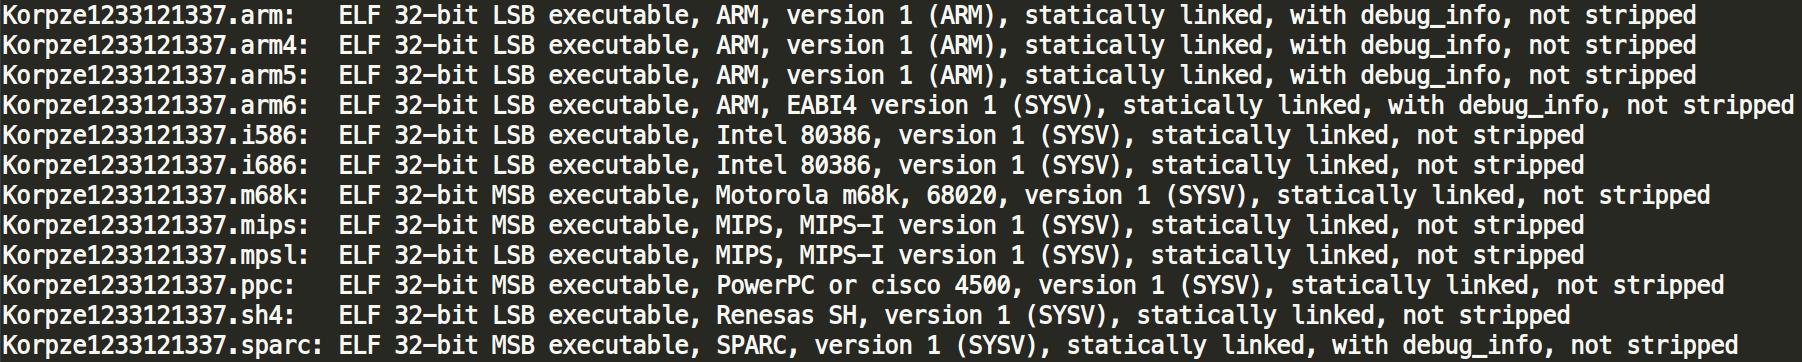 new botnet gafgyt mirai unstripped binary